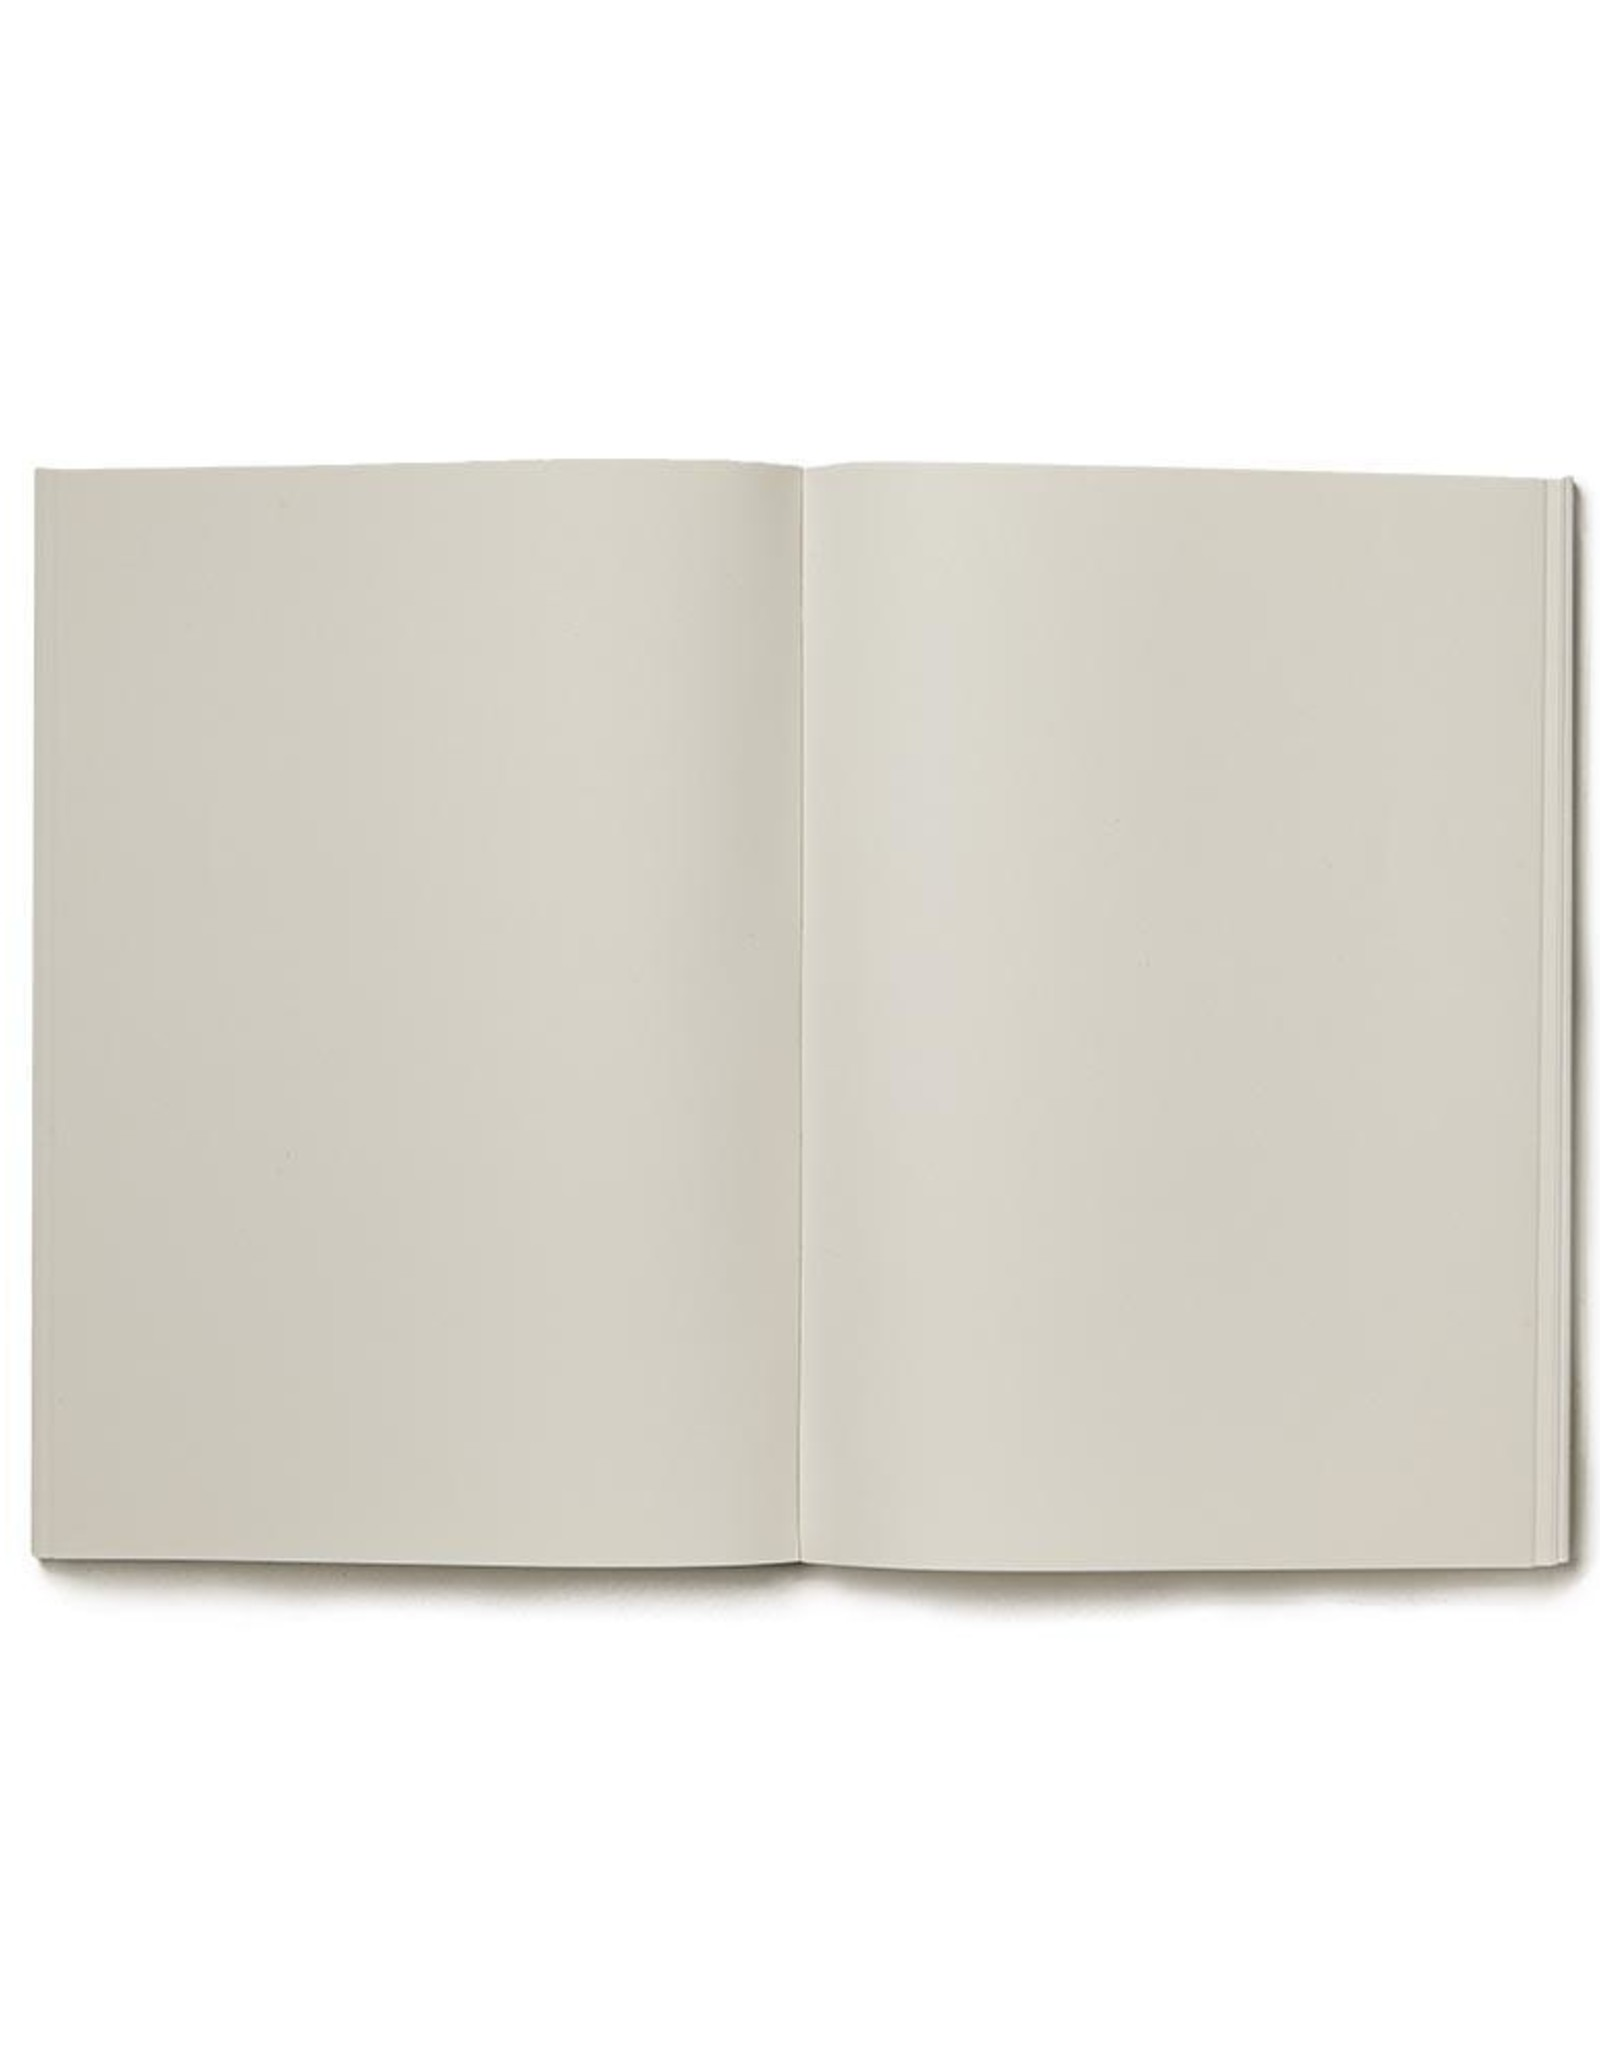 Wit & Delight Big Idea Sketchbook